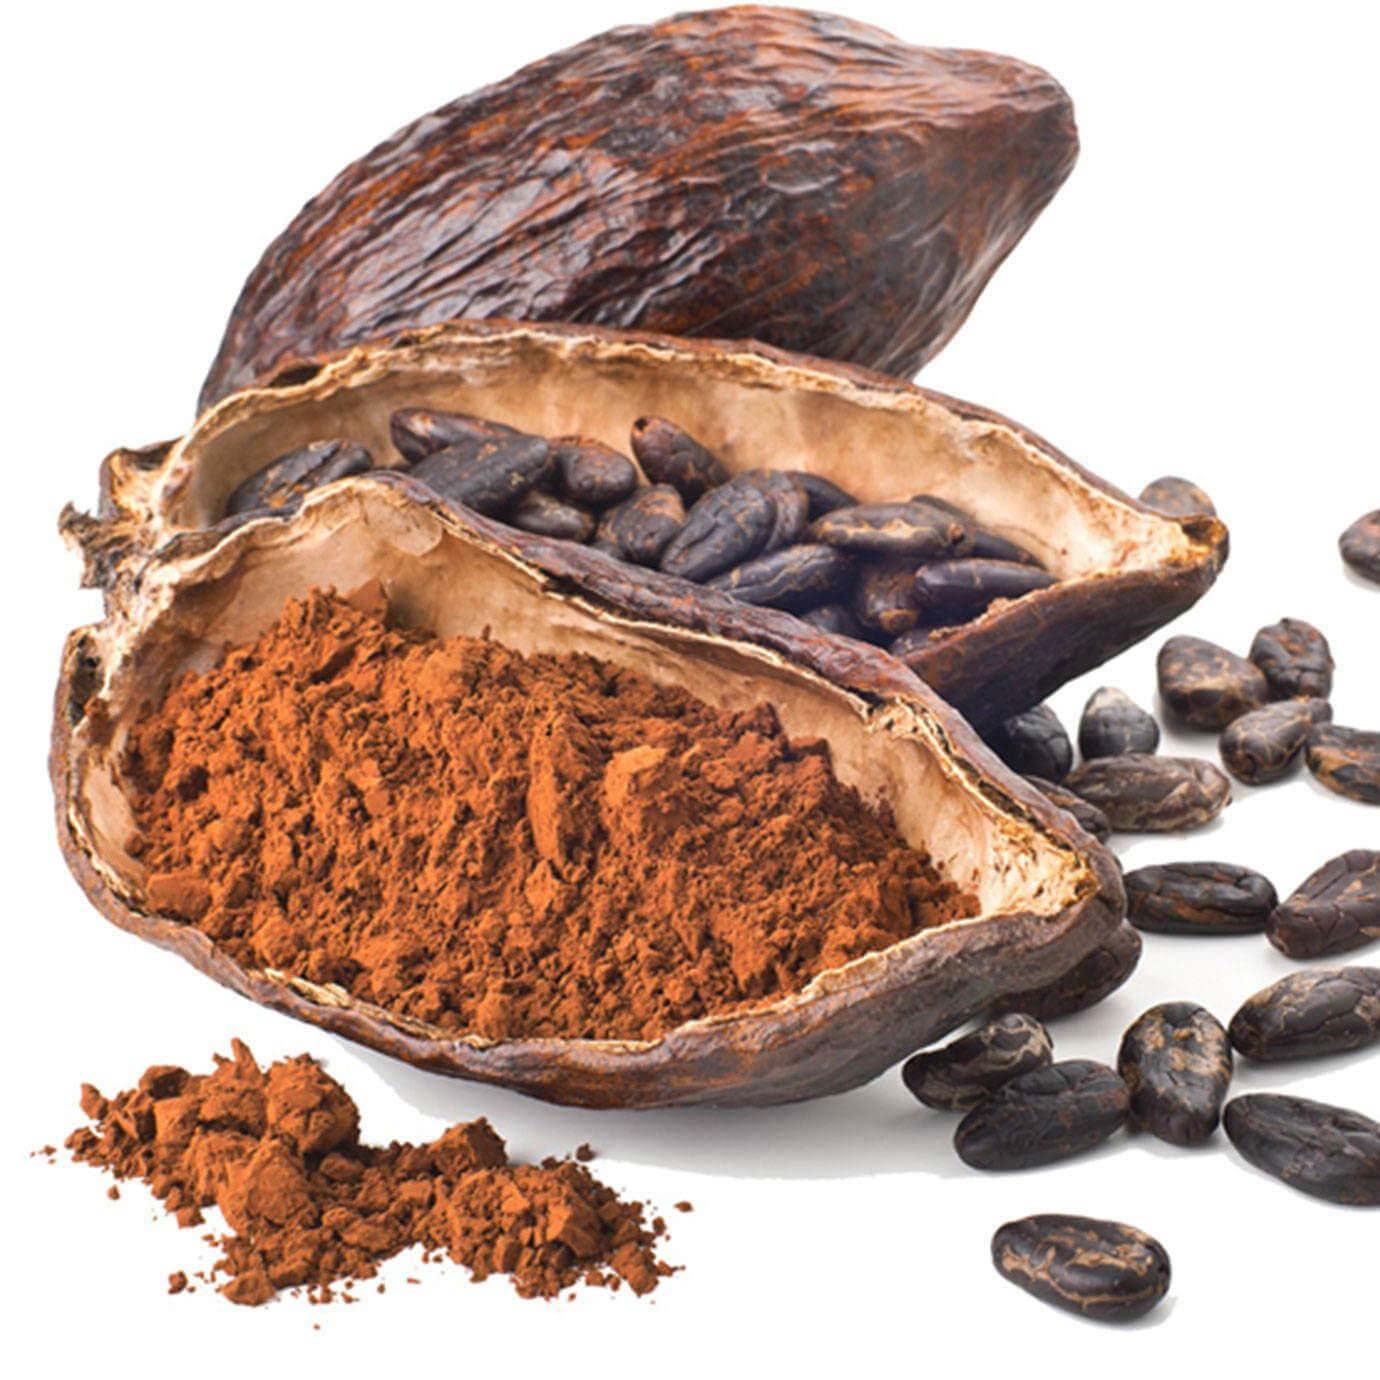 Cacao pod image